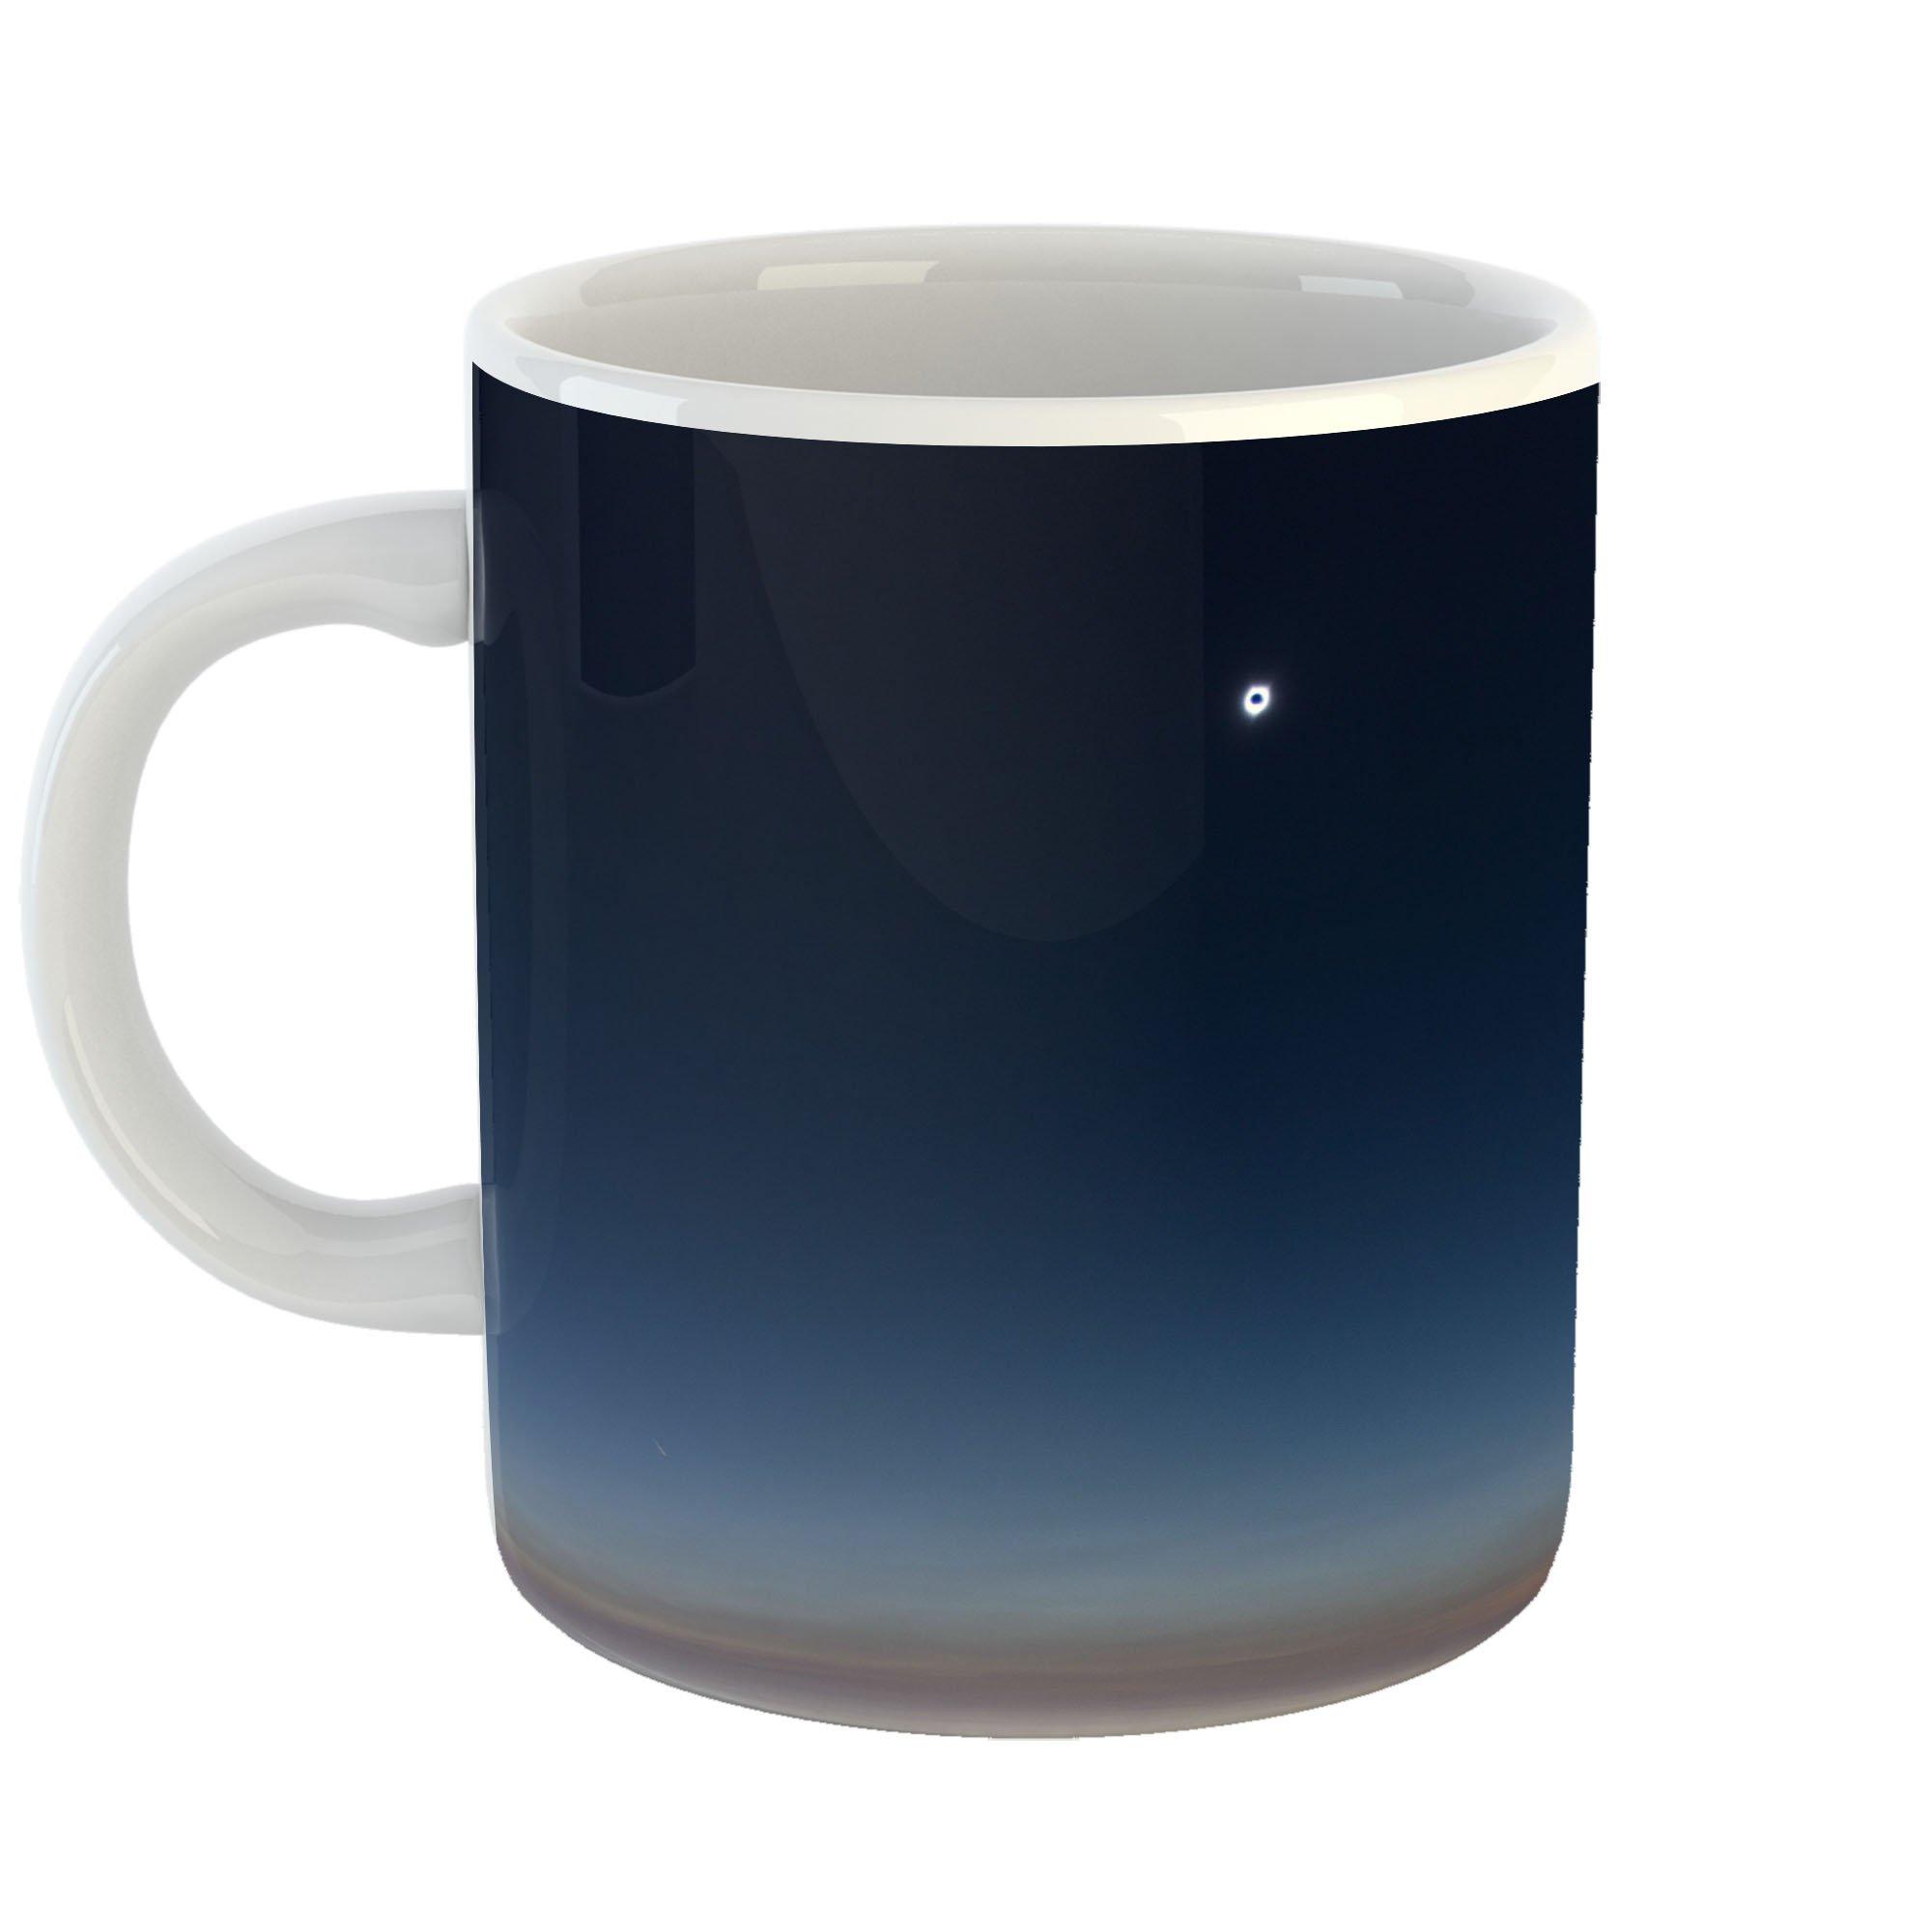 Westlake Art - Horizon Solar - 11oz Coffee Cup Mug - Modern Picture Photography Artwork Home Office Birthday Gift - 11 Ounce (1DB5-73036)